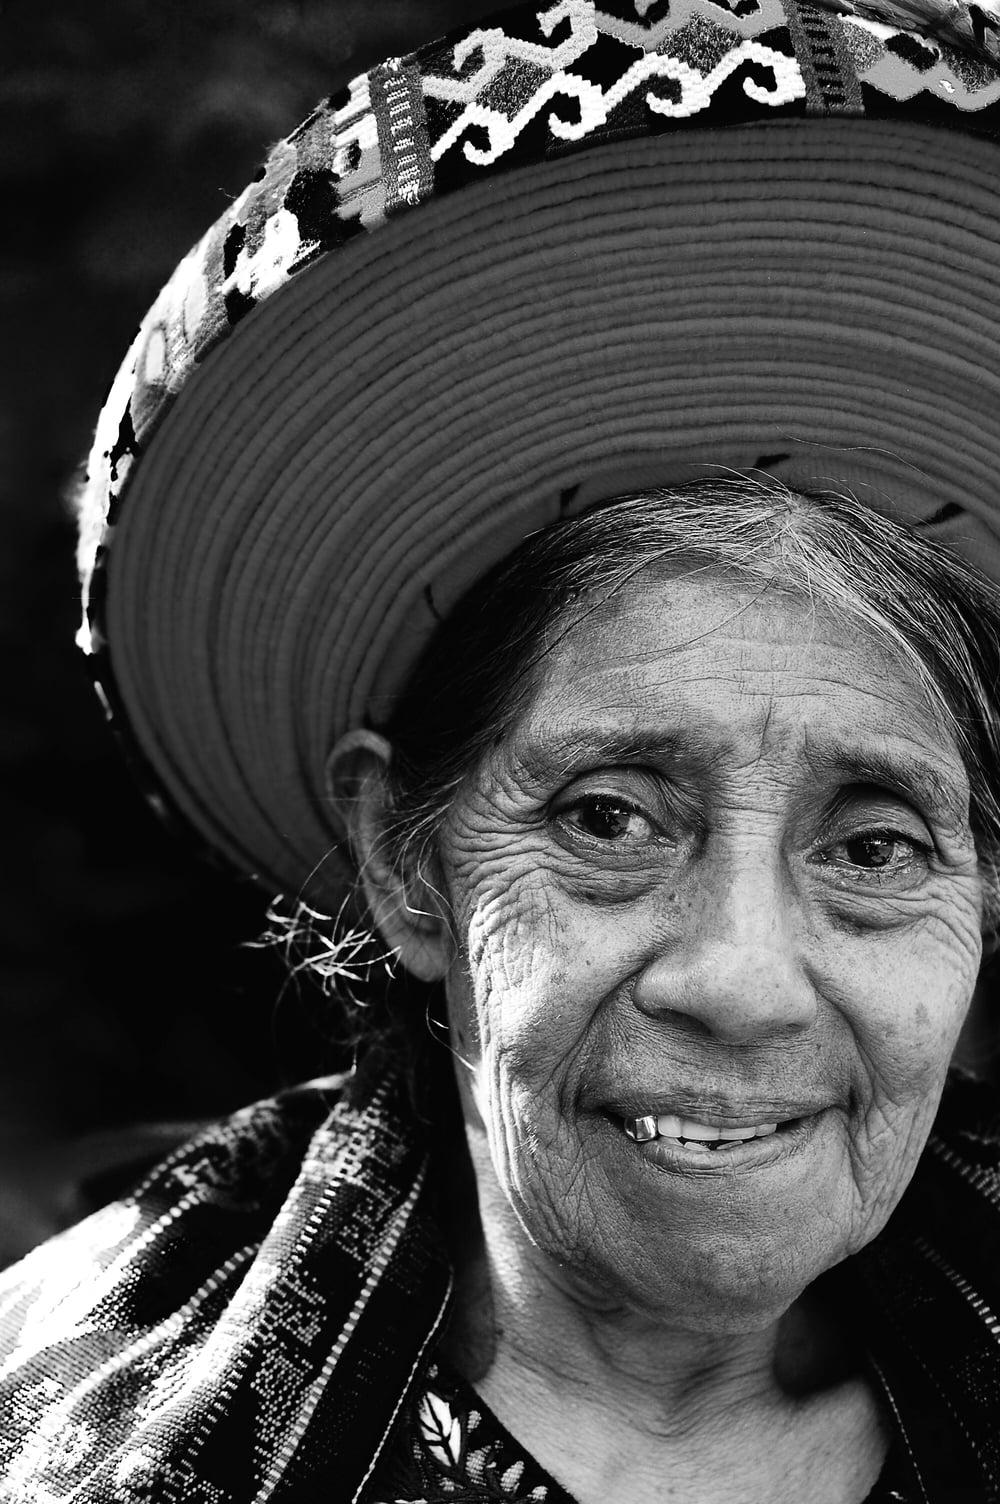 Santiago, Guatemala 2015